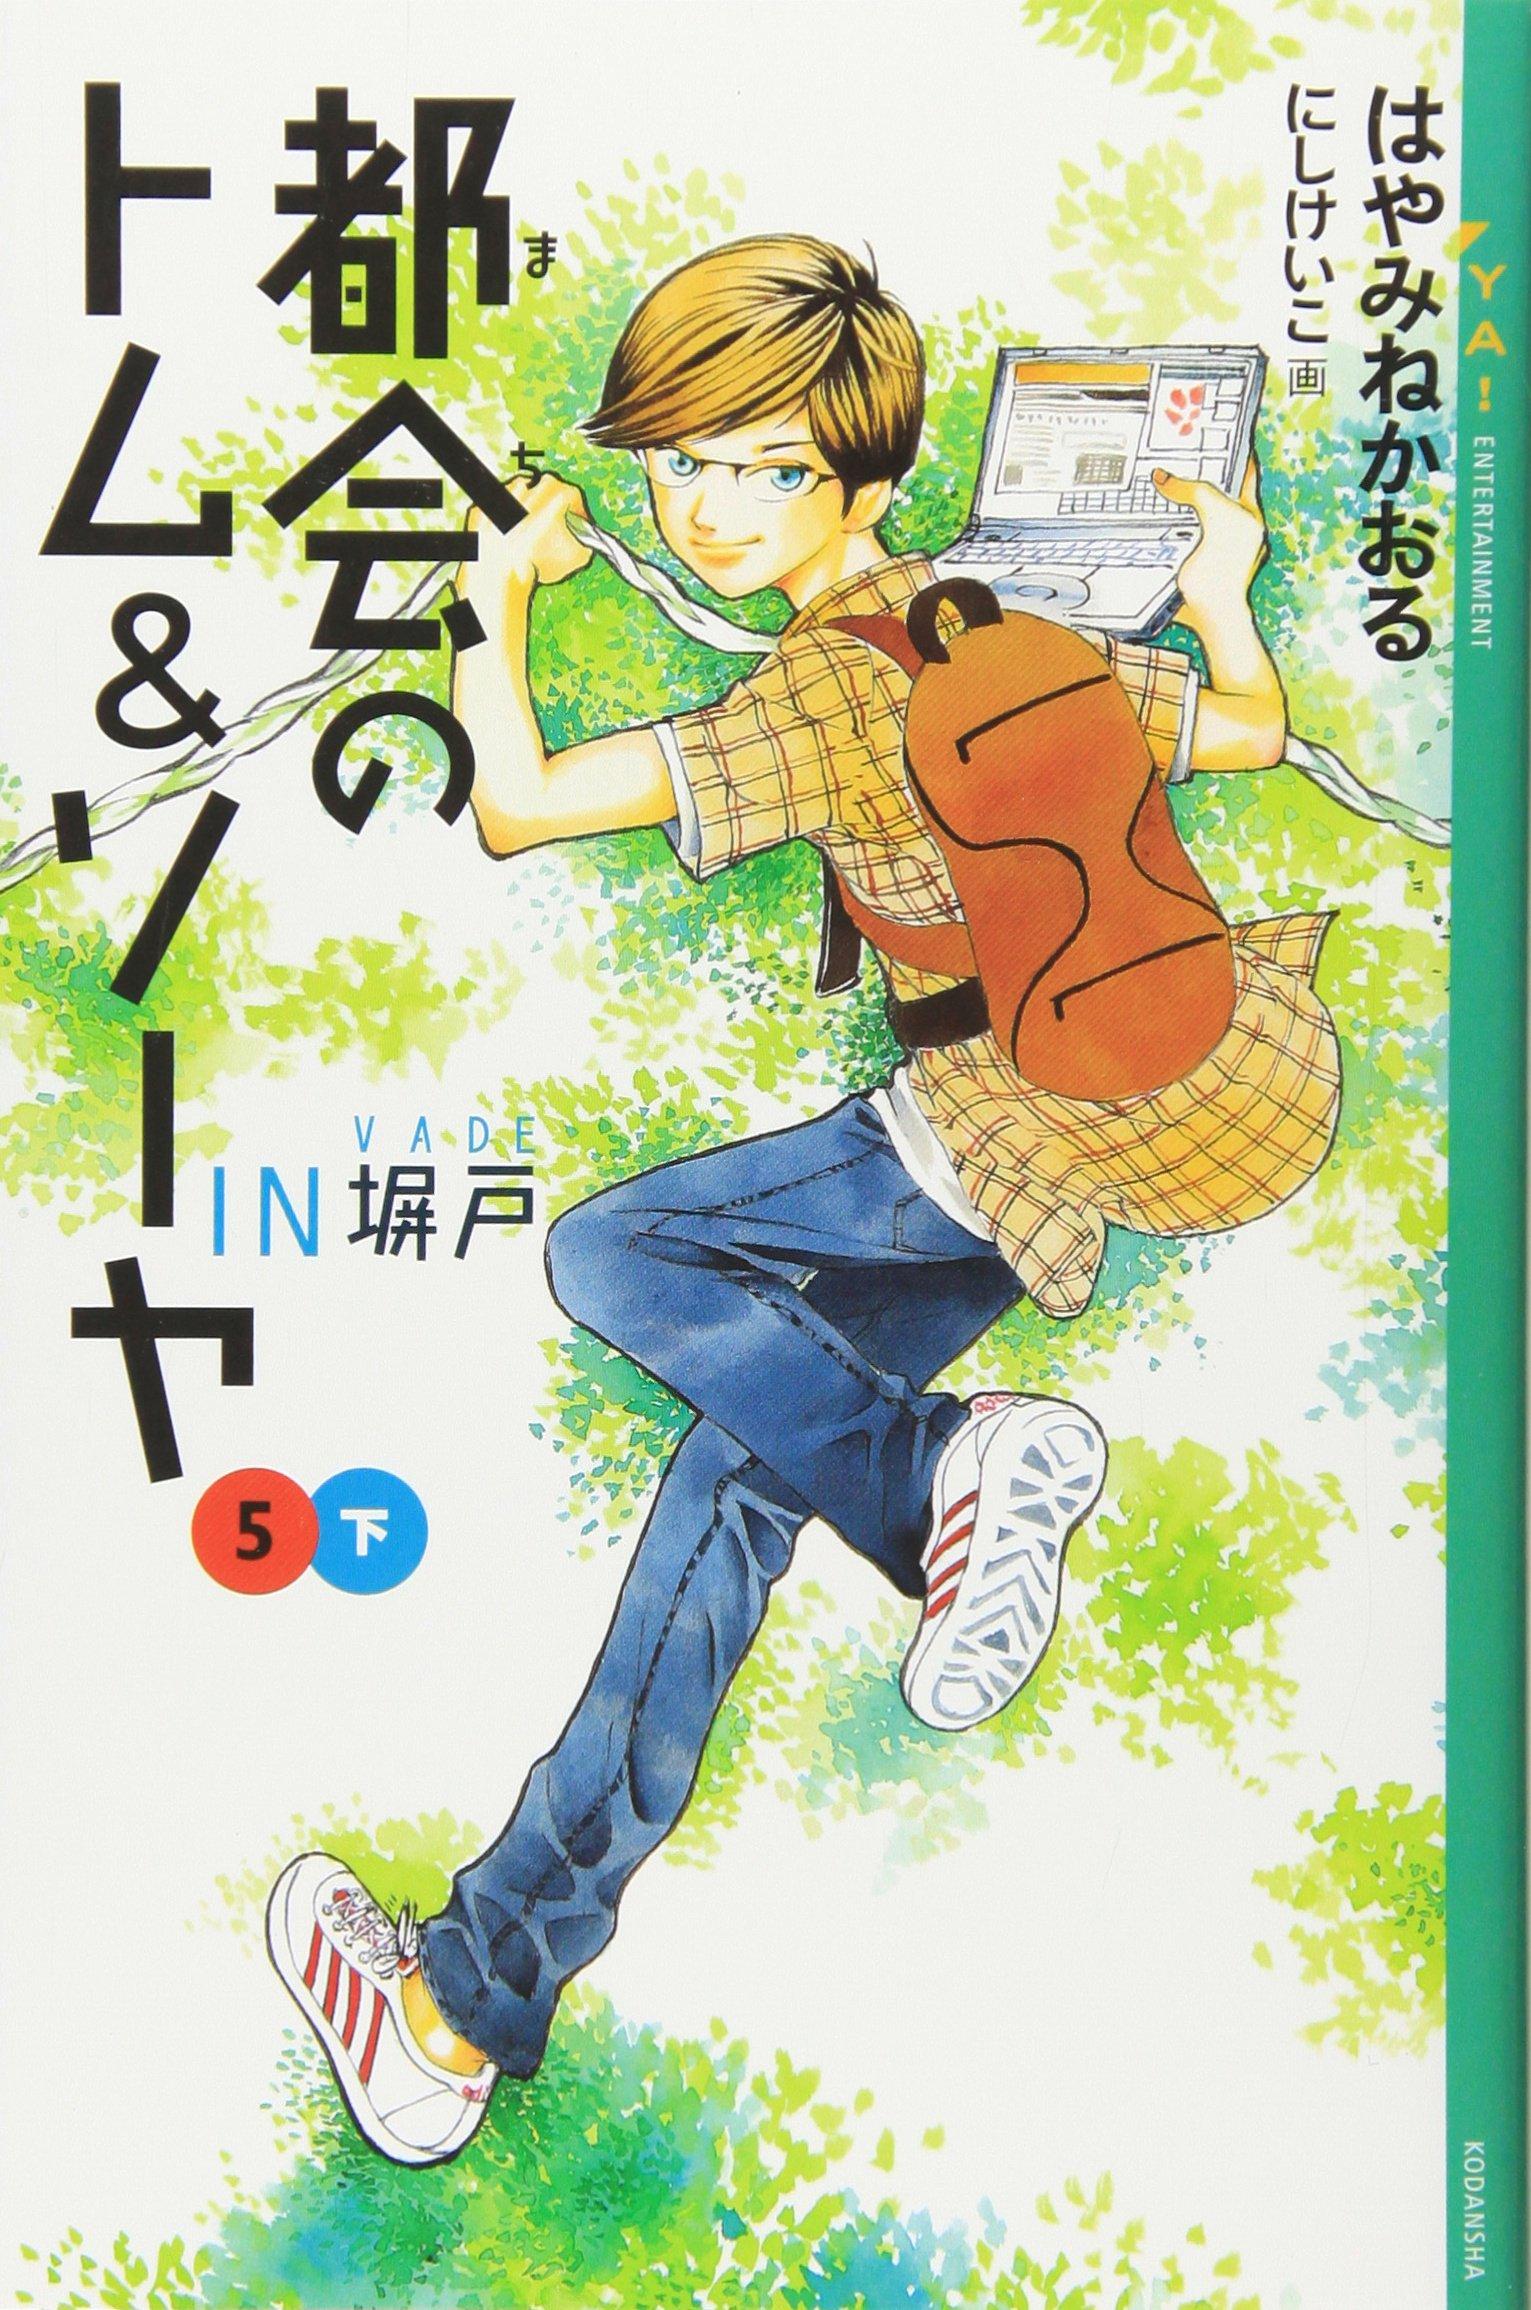 Download Tom Sawyer and urban (5) IN fence door under (YA! ENTERTAINMENT) (2007) ISBN: 4062693852 [Japanese Import] ebook